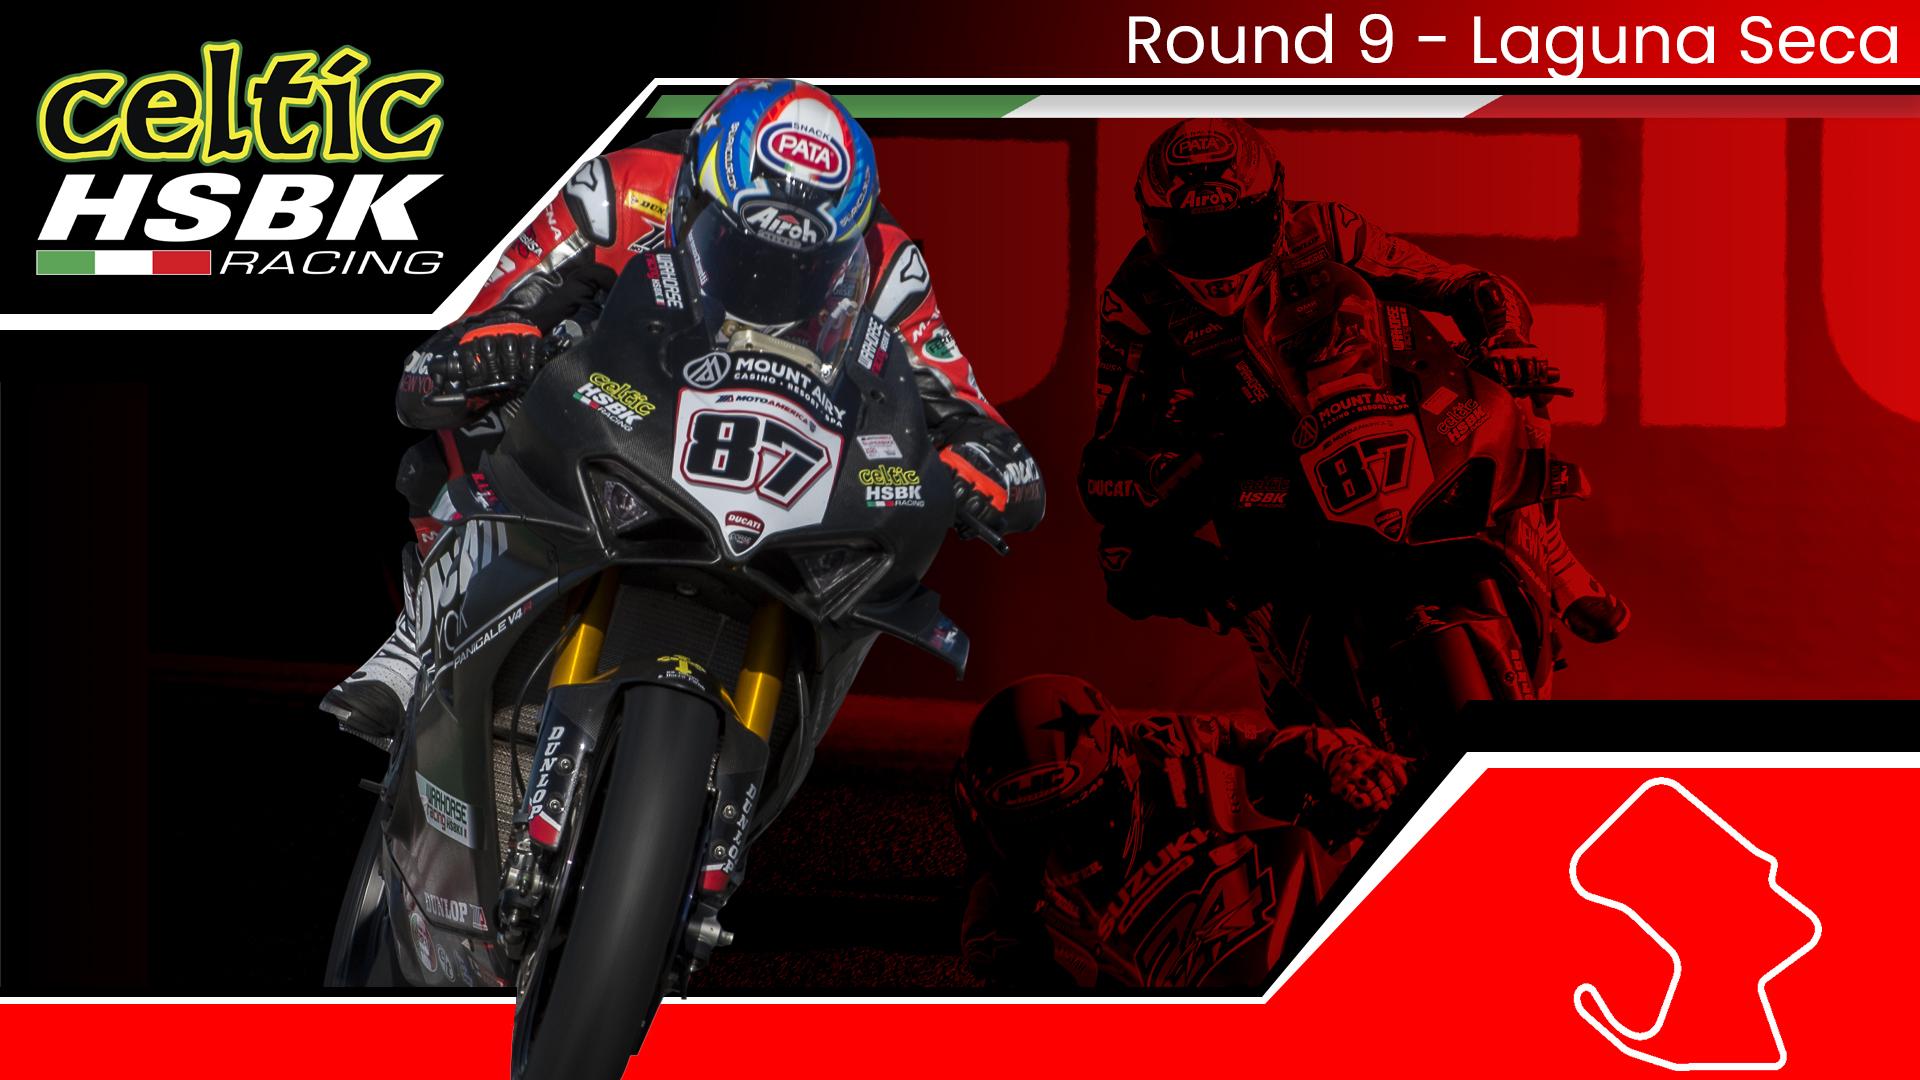 Celtic HSBK Racing Closes Season With 3 Podiums at Laguna on Ducati SBK (2020 MotoAmerica Round 9)